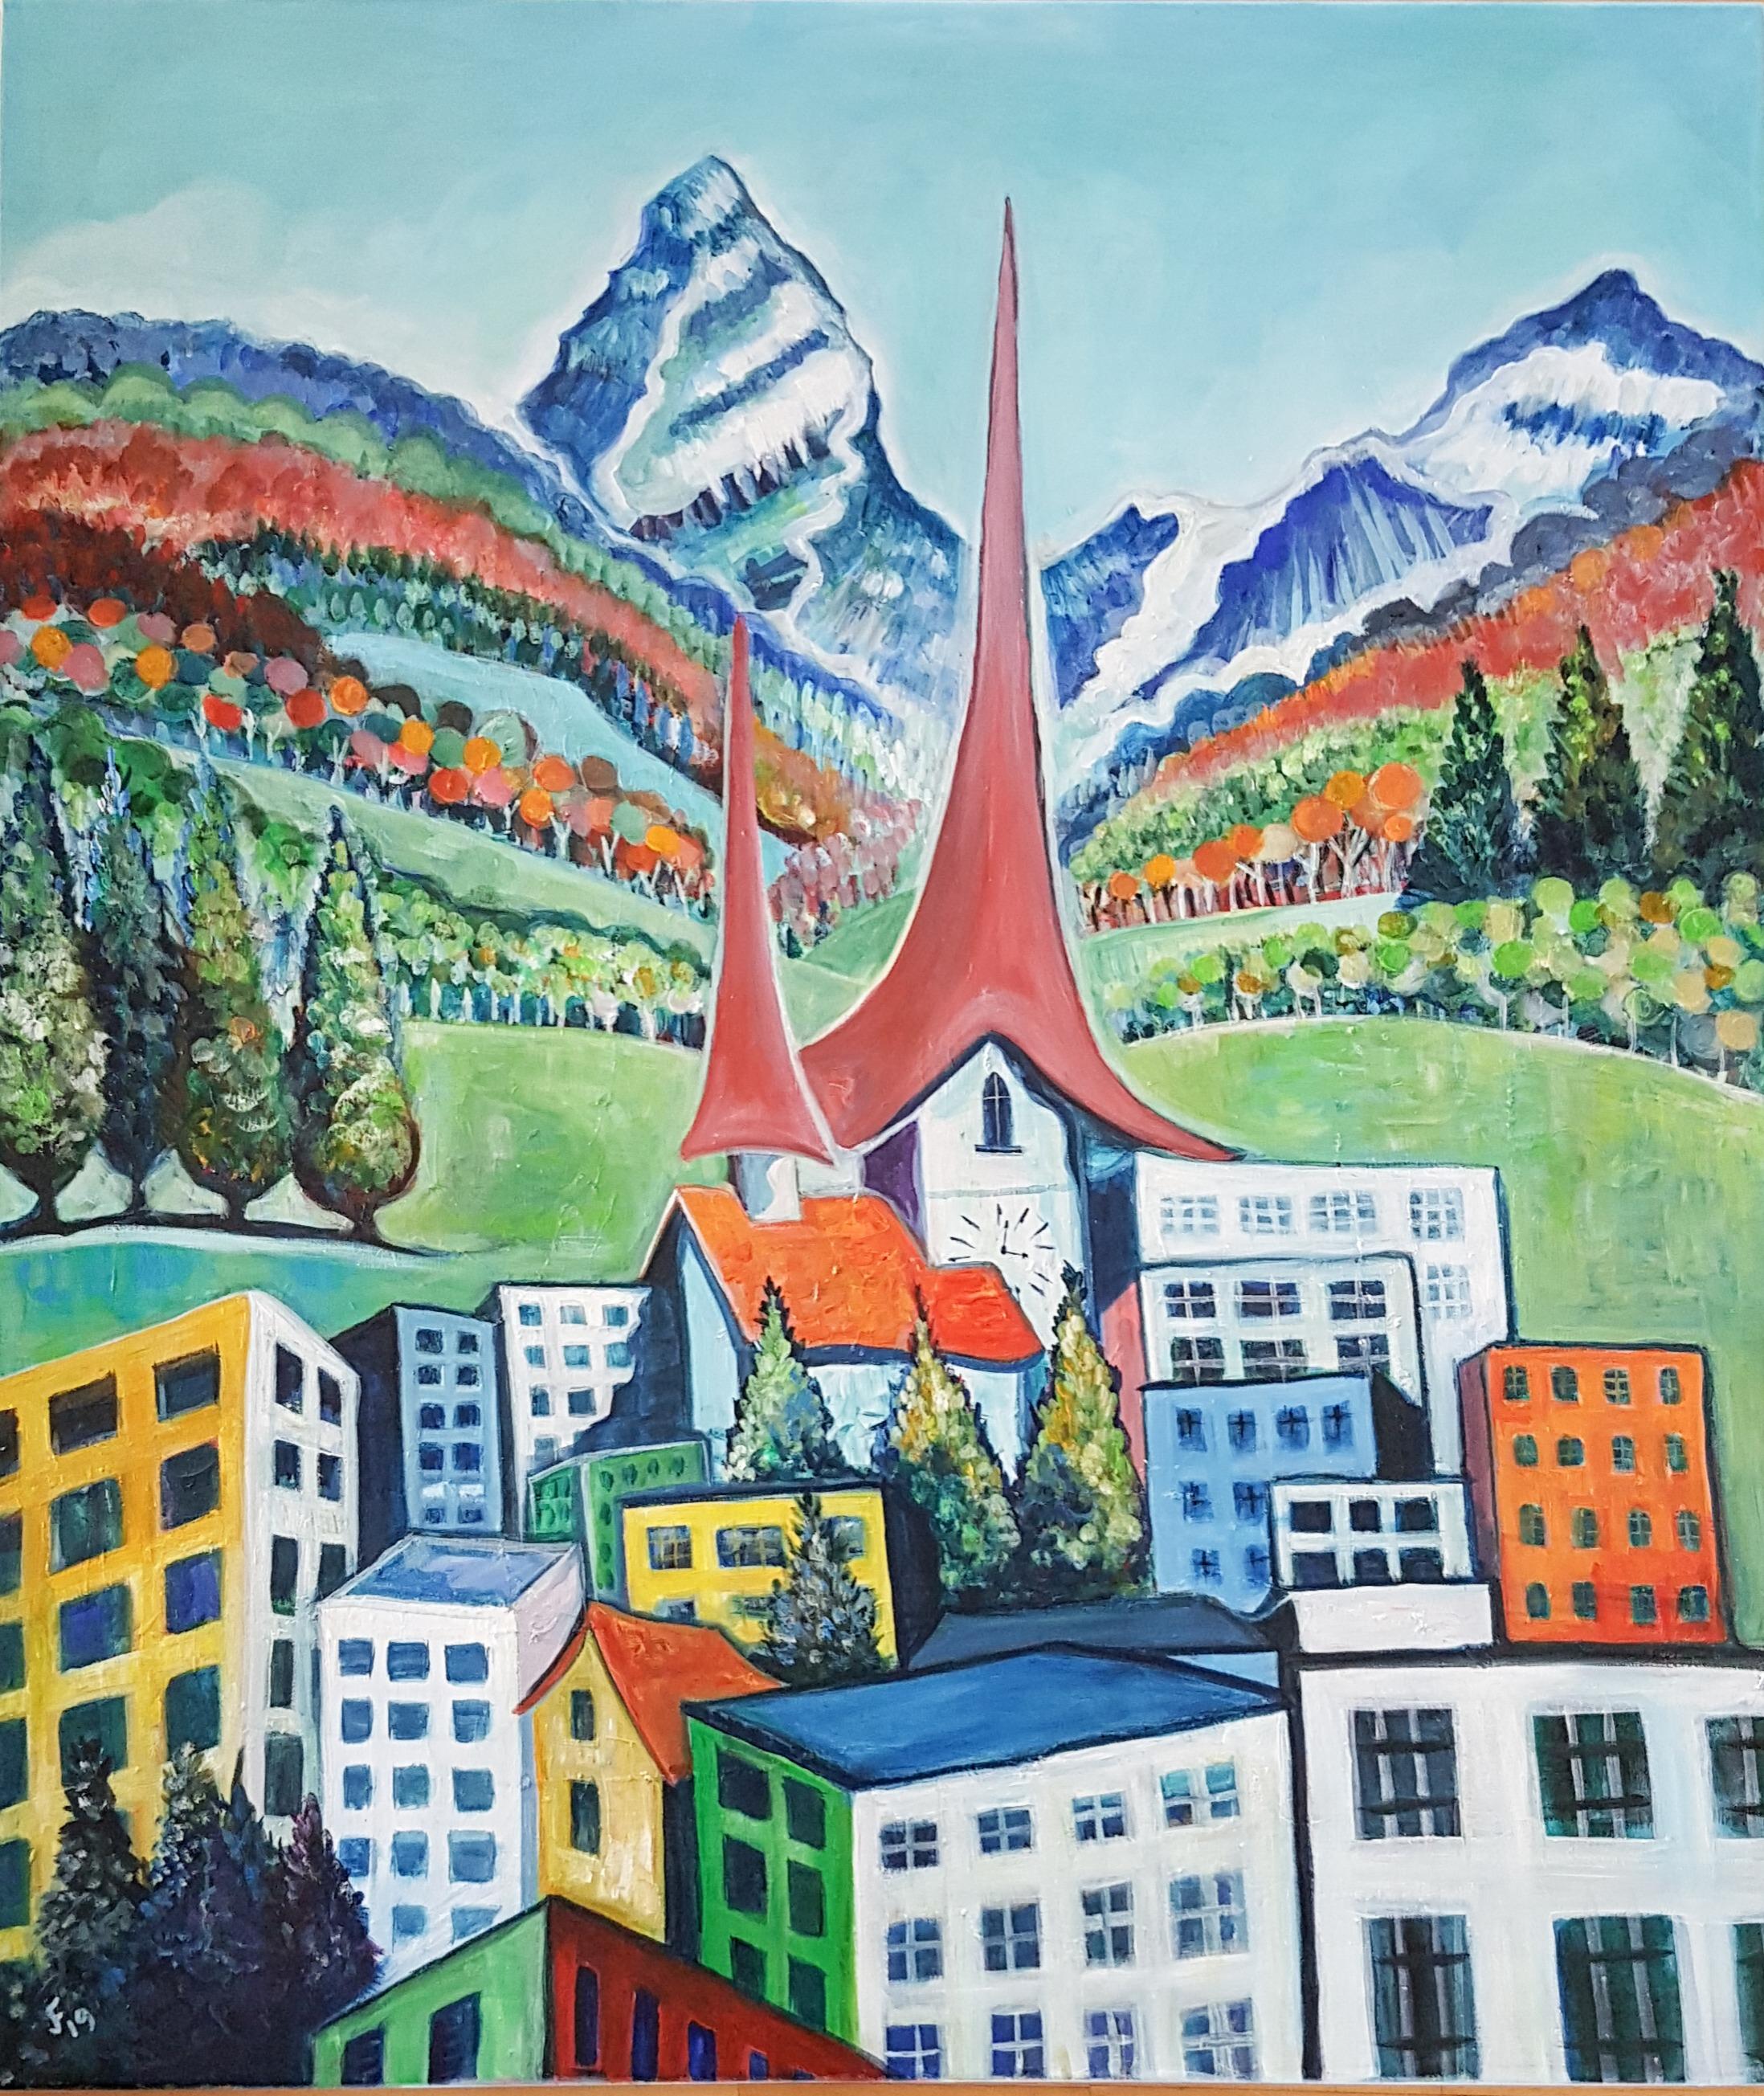 Davos Dorf 2019